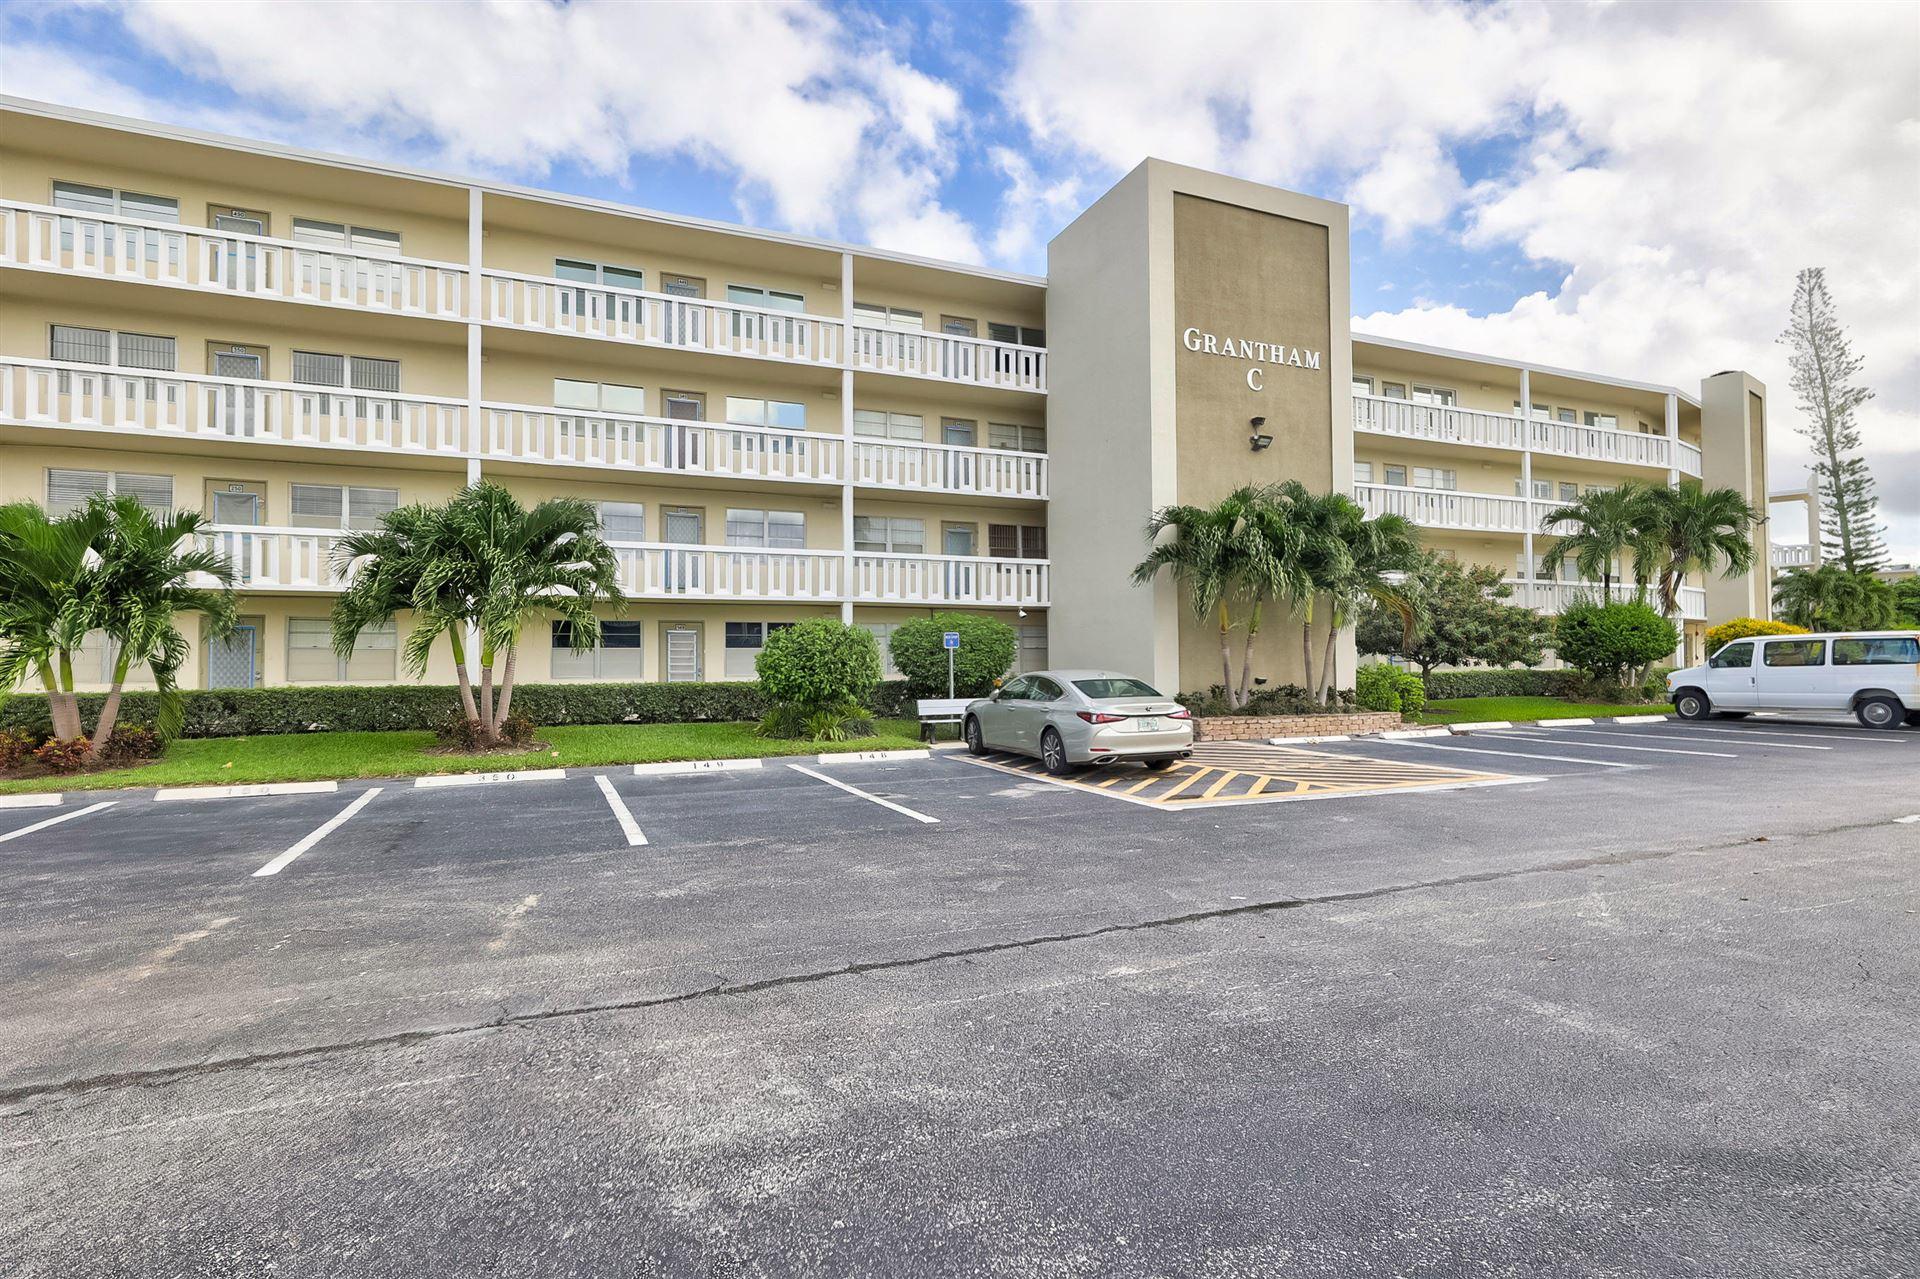 254 Grantham C, Deerfield Beach, FL 33442 - #: RX-10658142